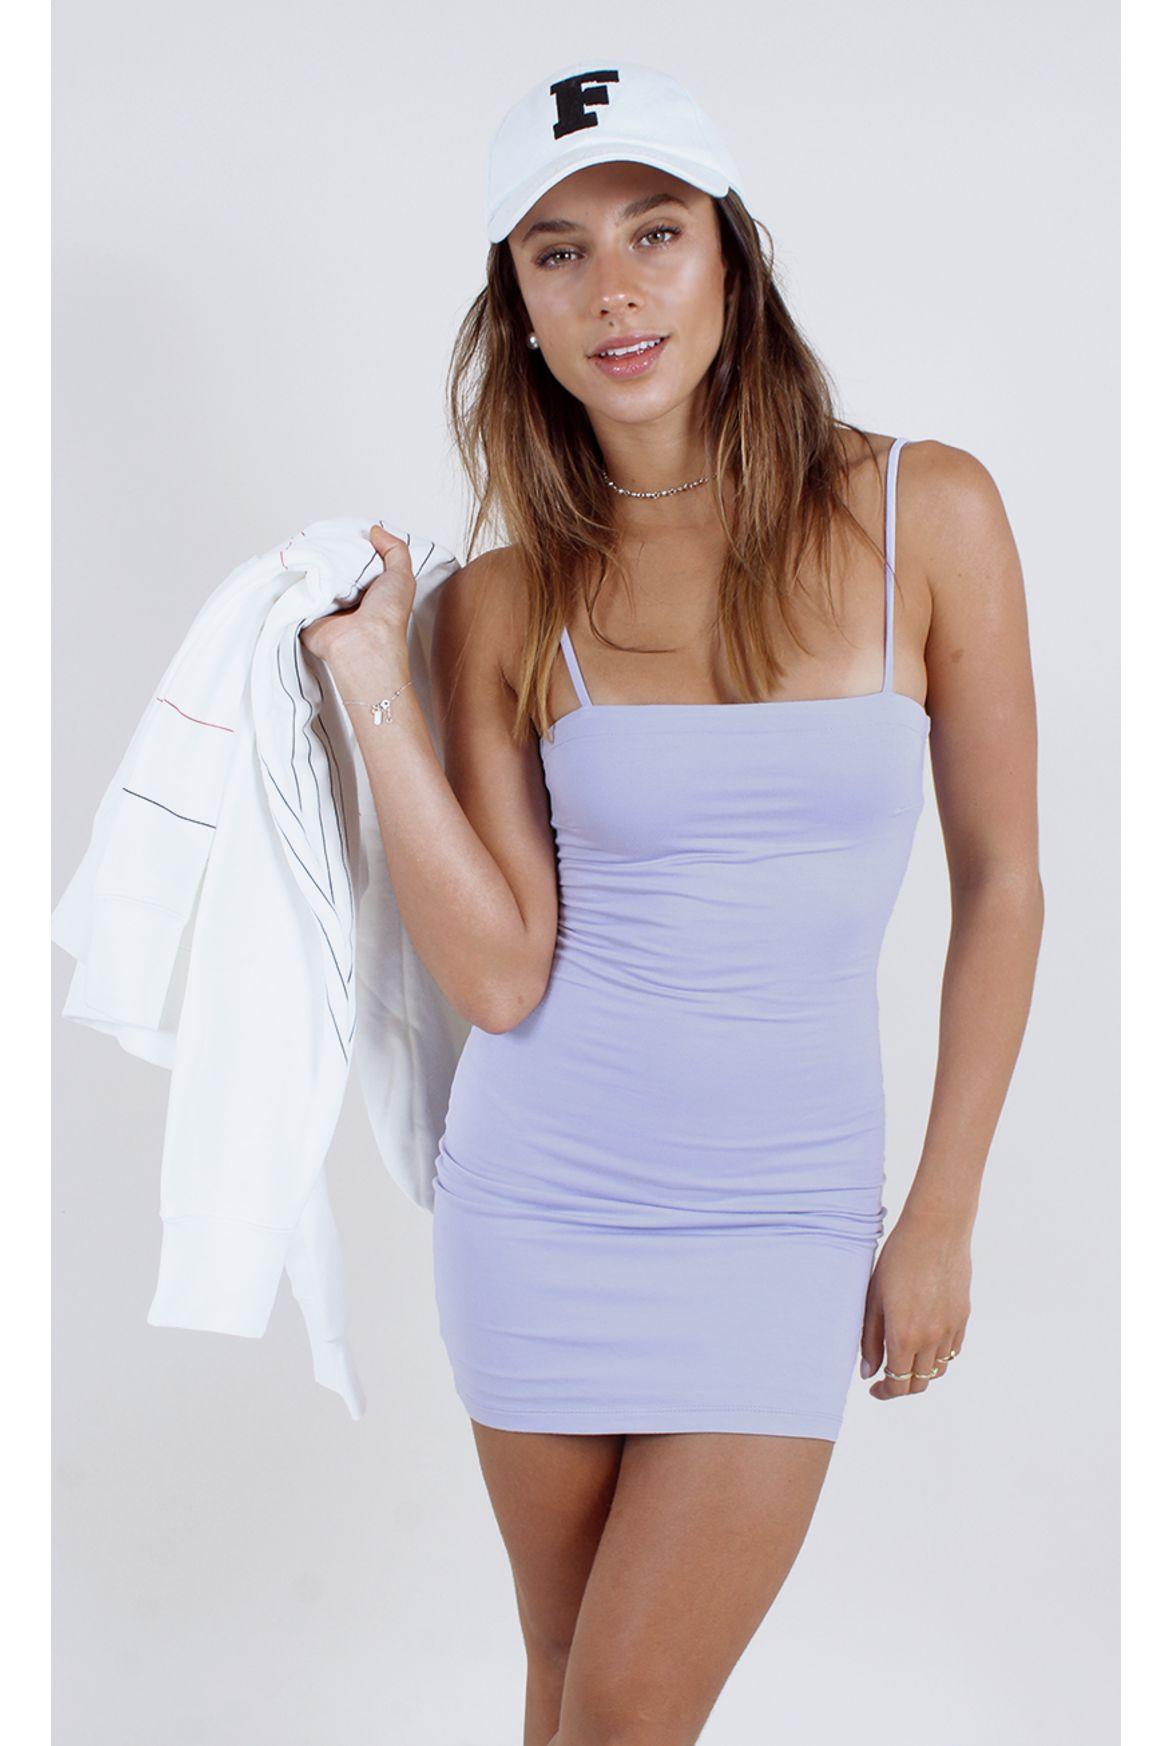 403257ee0f FSHN - vestido sunshine decote reto lilás - Fashion Closet